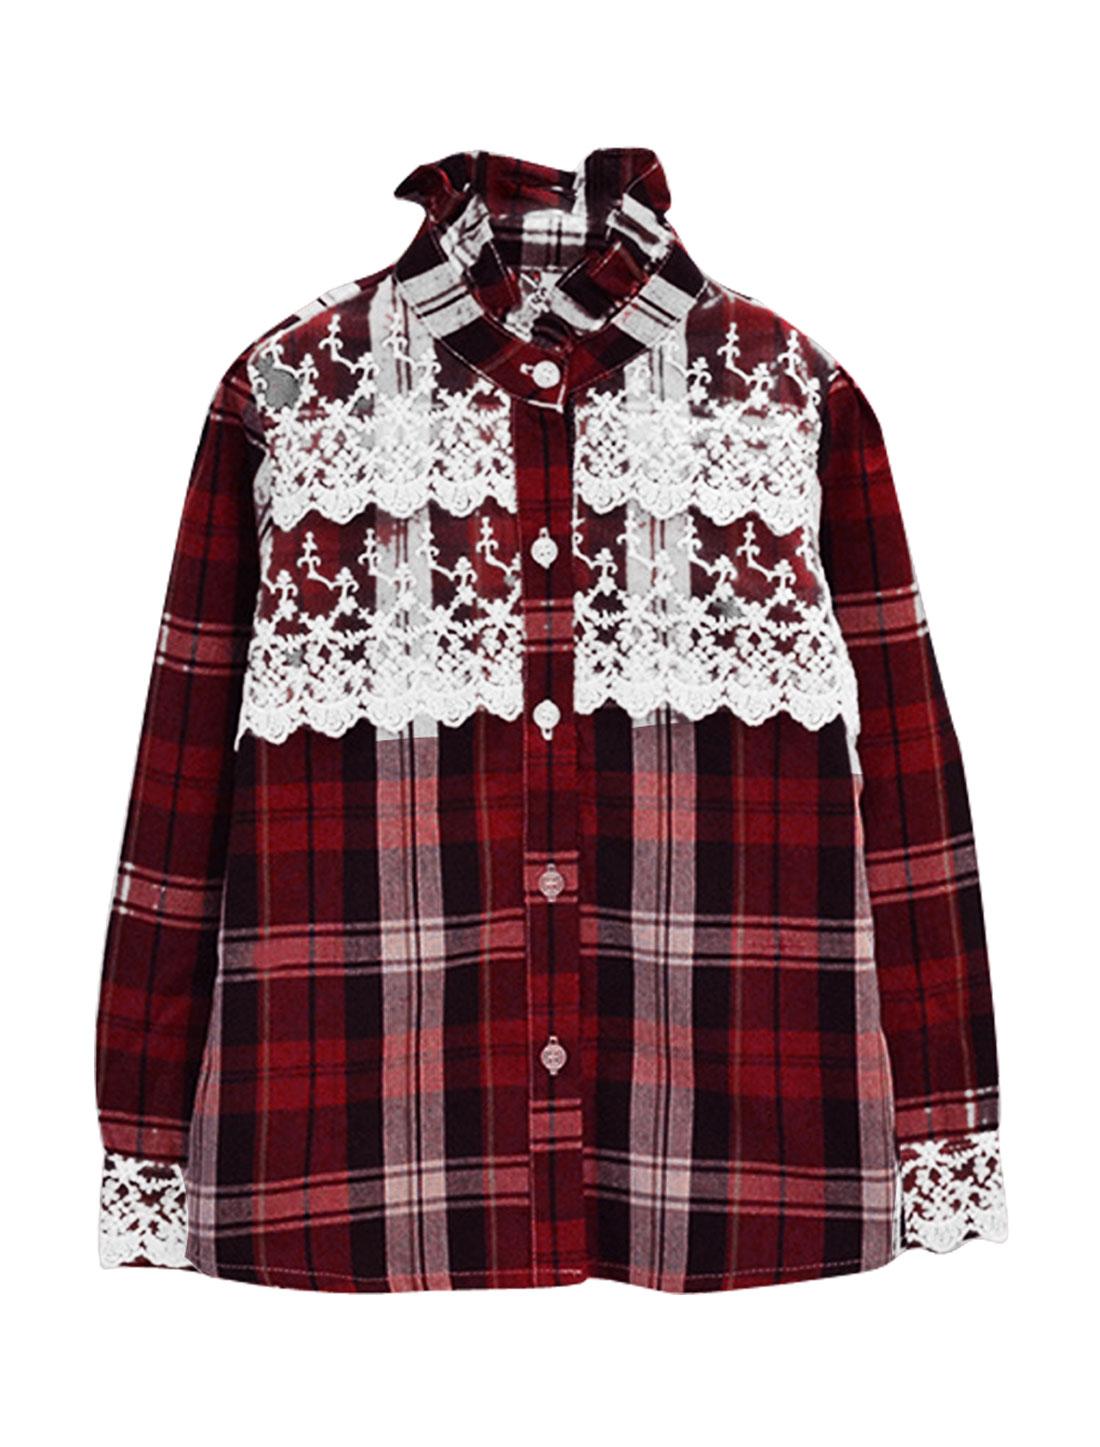 Kids Girls Single Breasted Plaids Pattern Lace Decor Detail Slim Fit Shirt Burgundy US Size 10